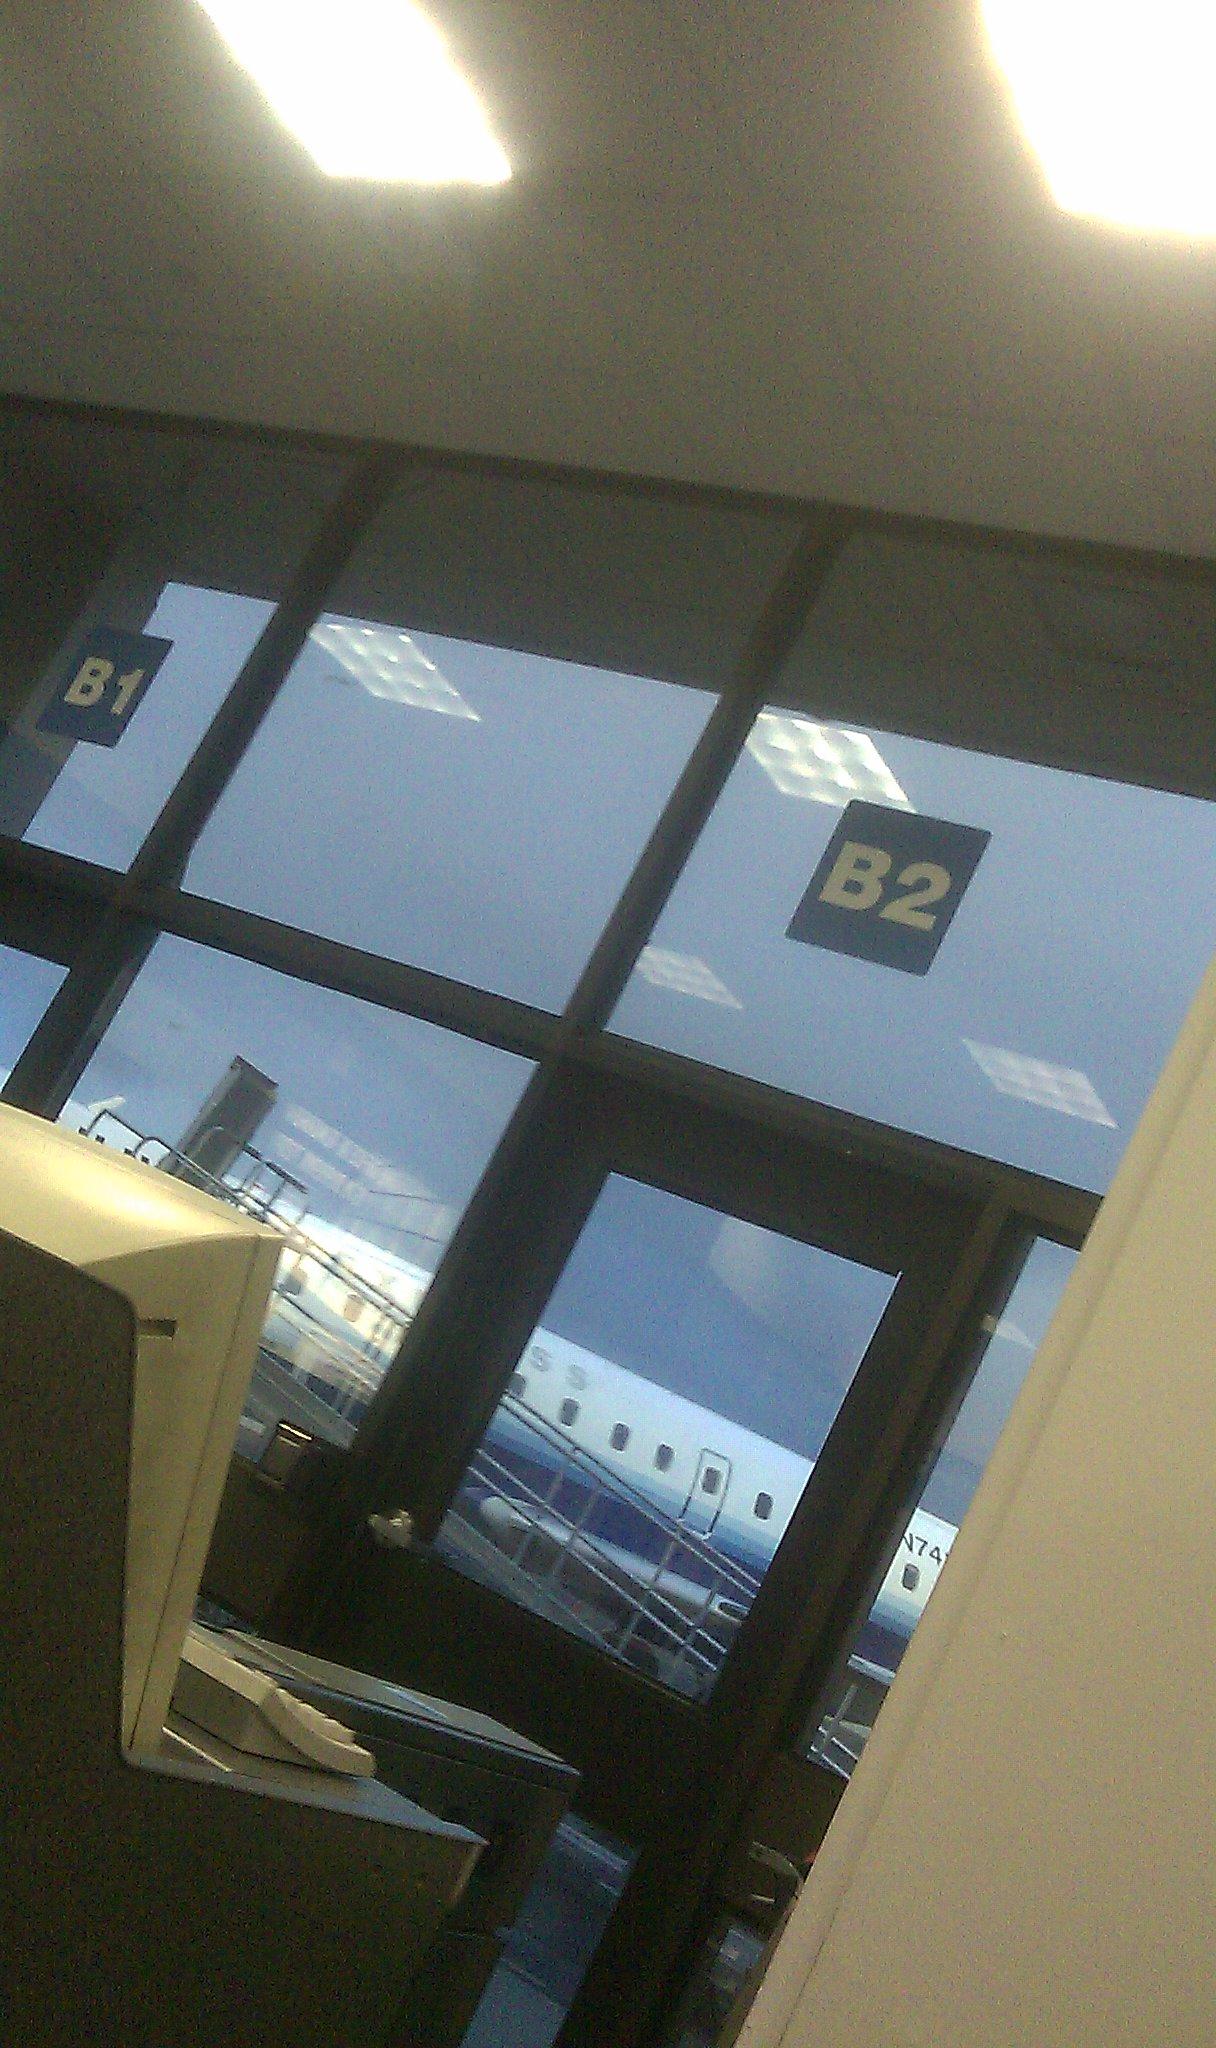 Terminal B2